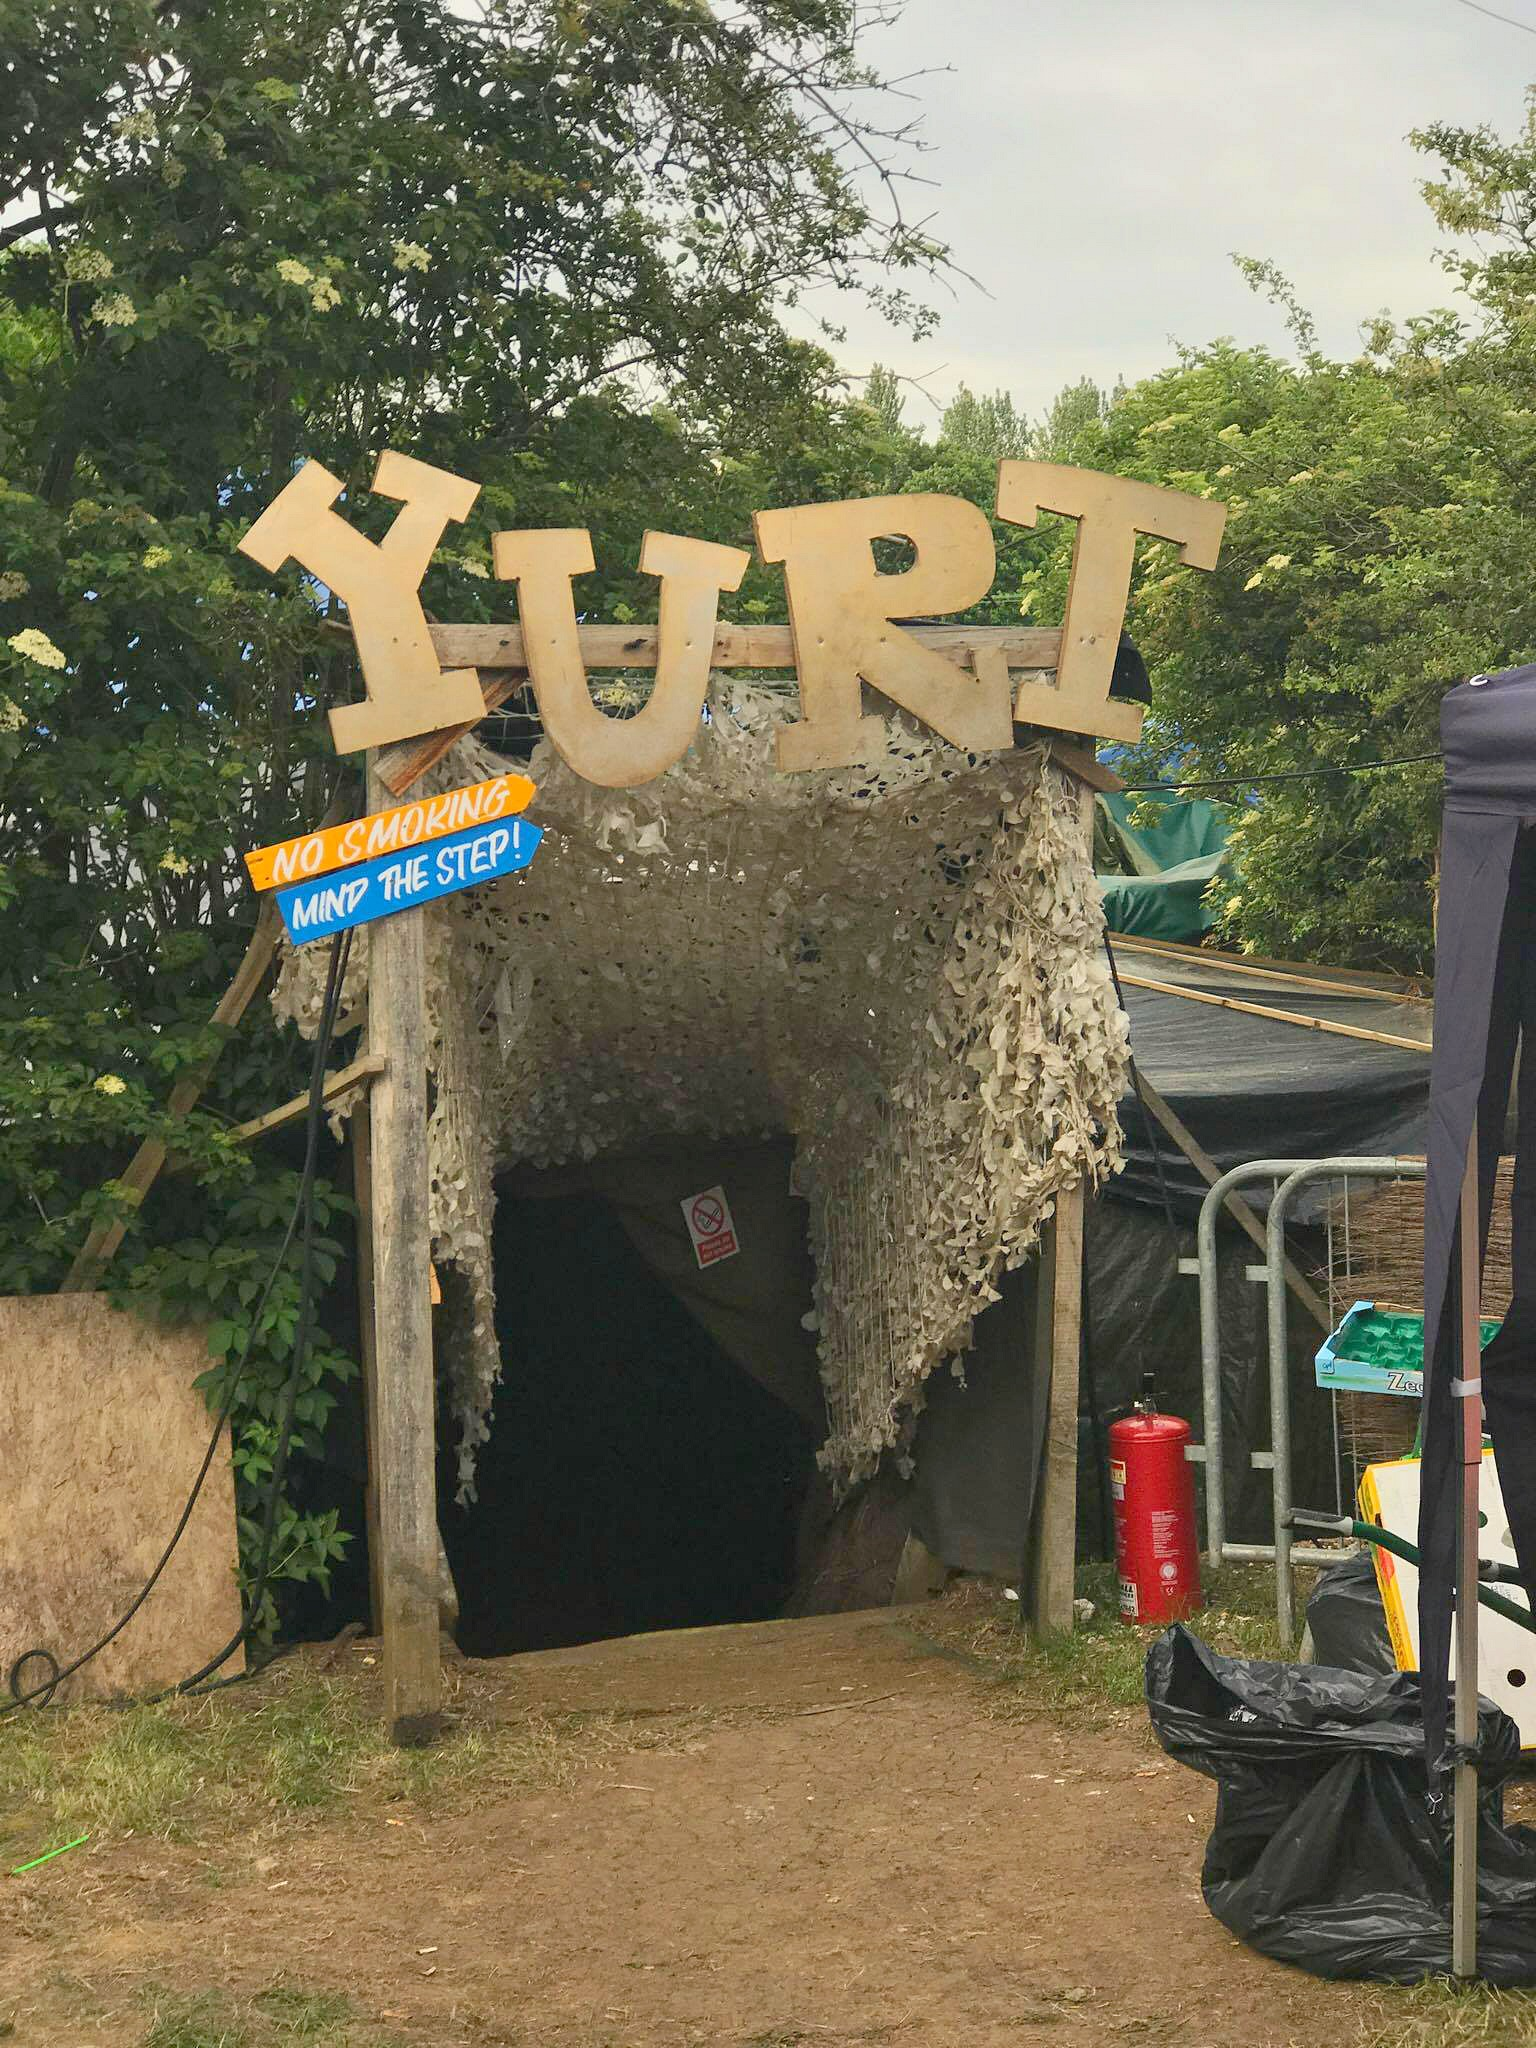 HogSozzle Yurt